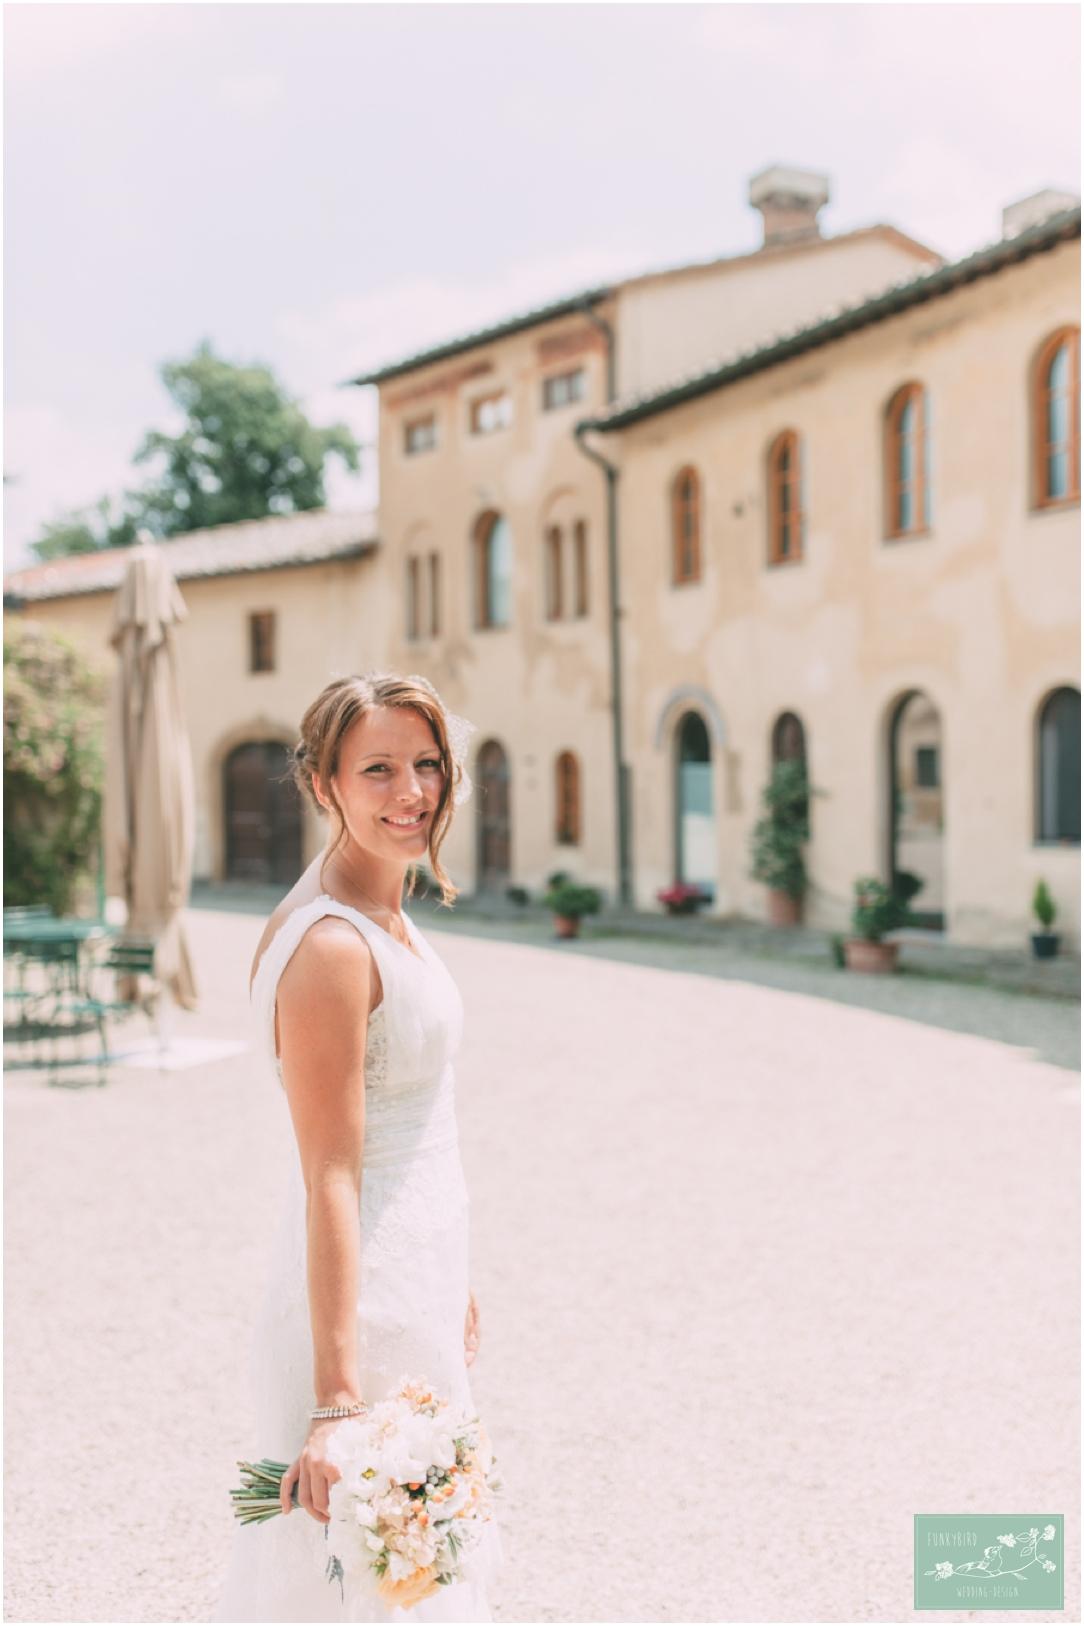 trouwen in toscane_flowers in Tuscany_tuscany wedding_0136.jpg